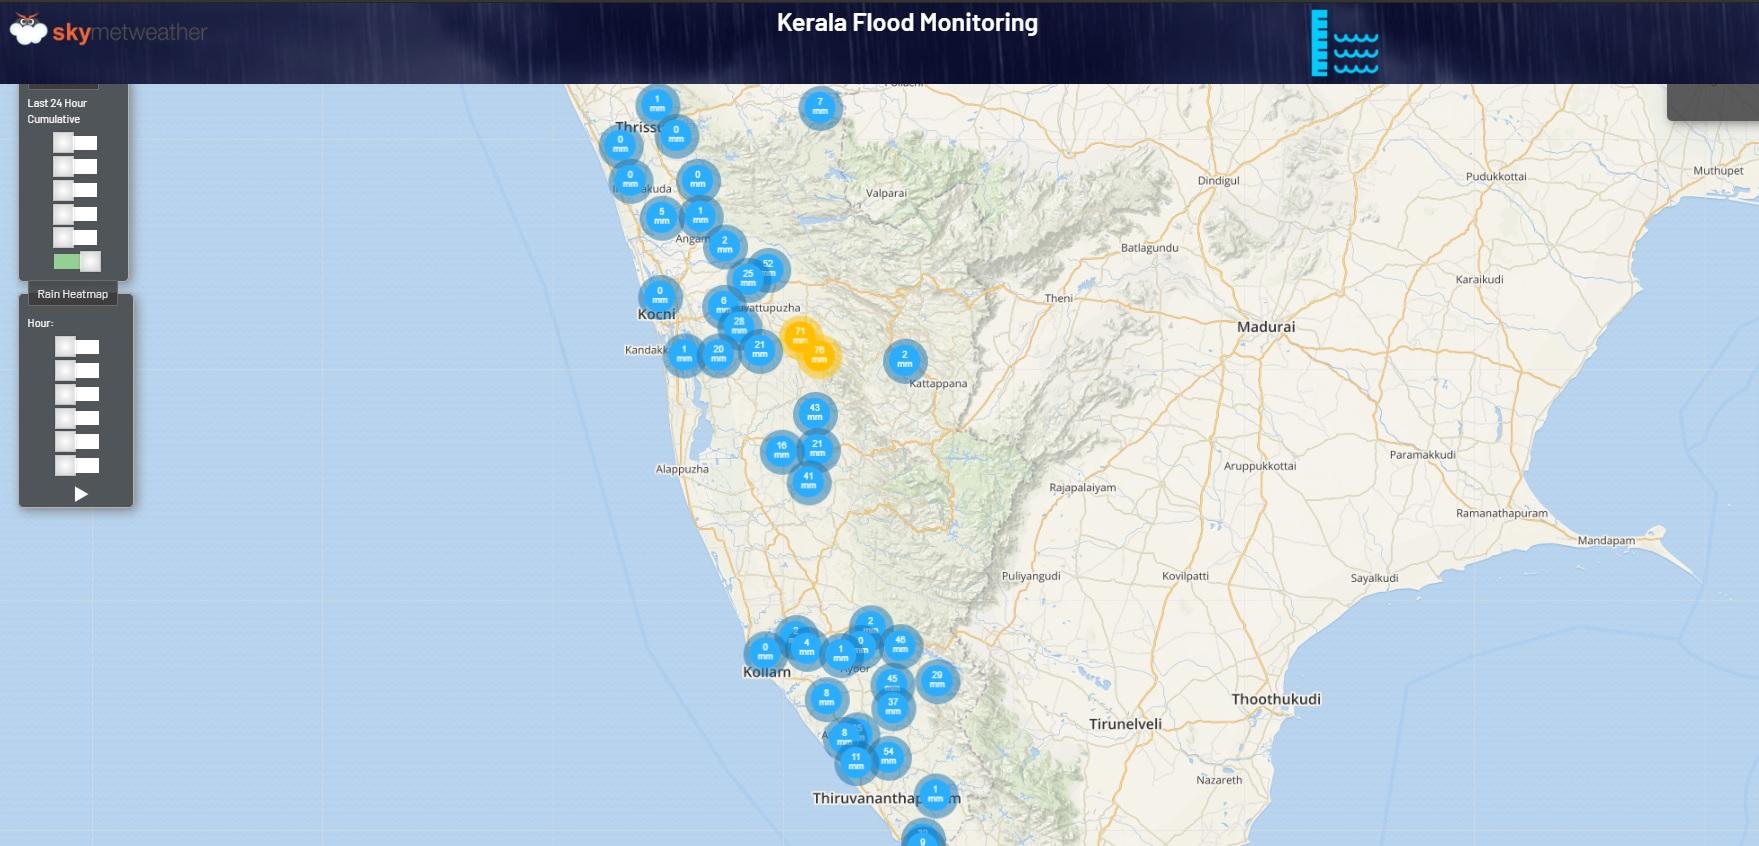 Kerala Rainfall recorded on May 29